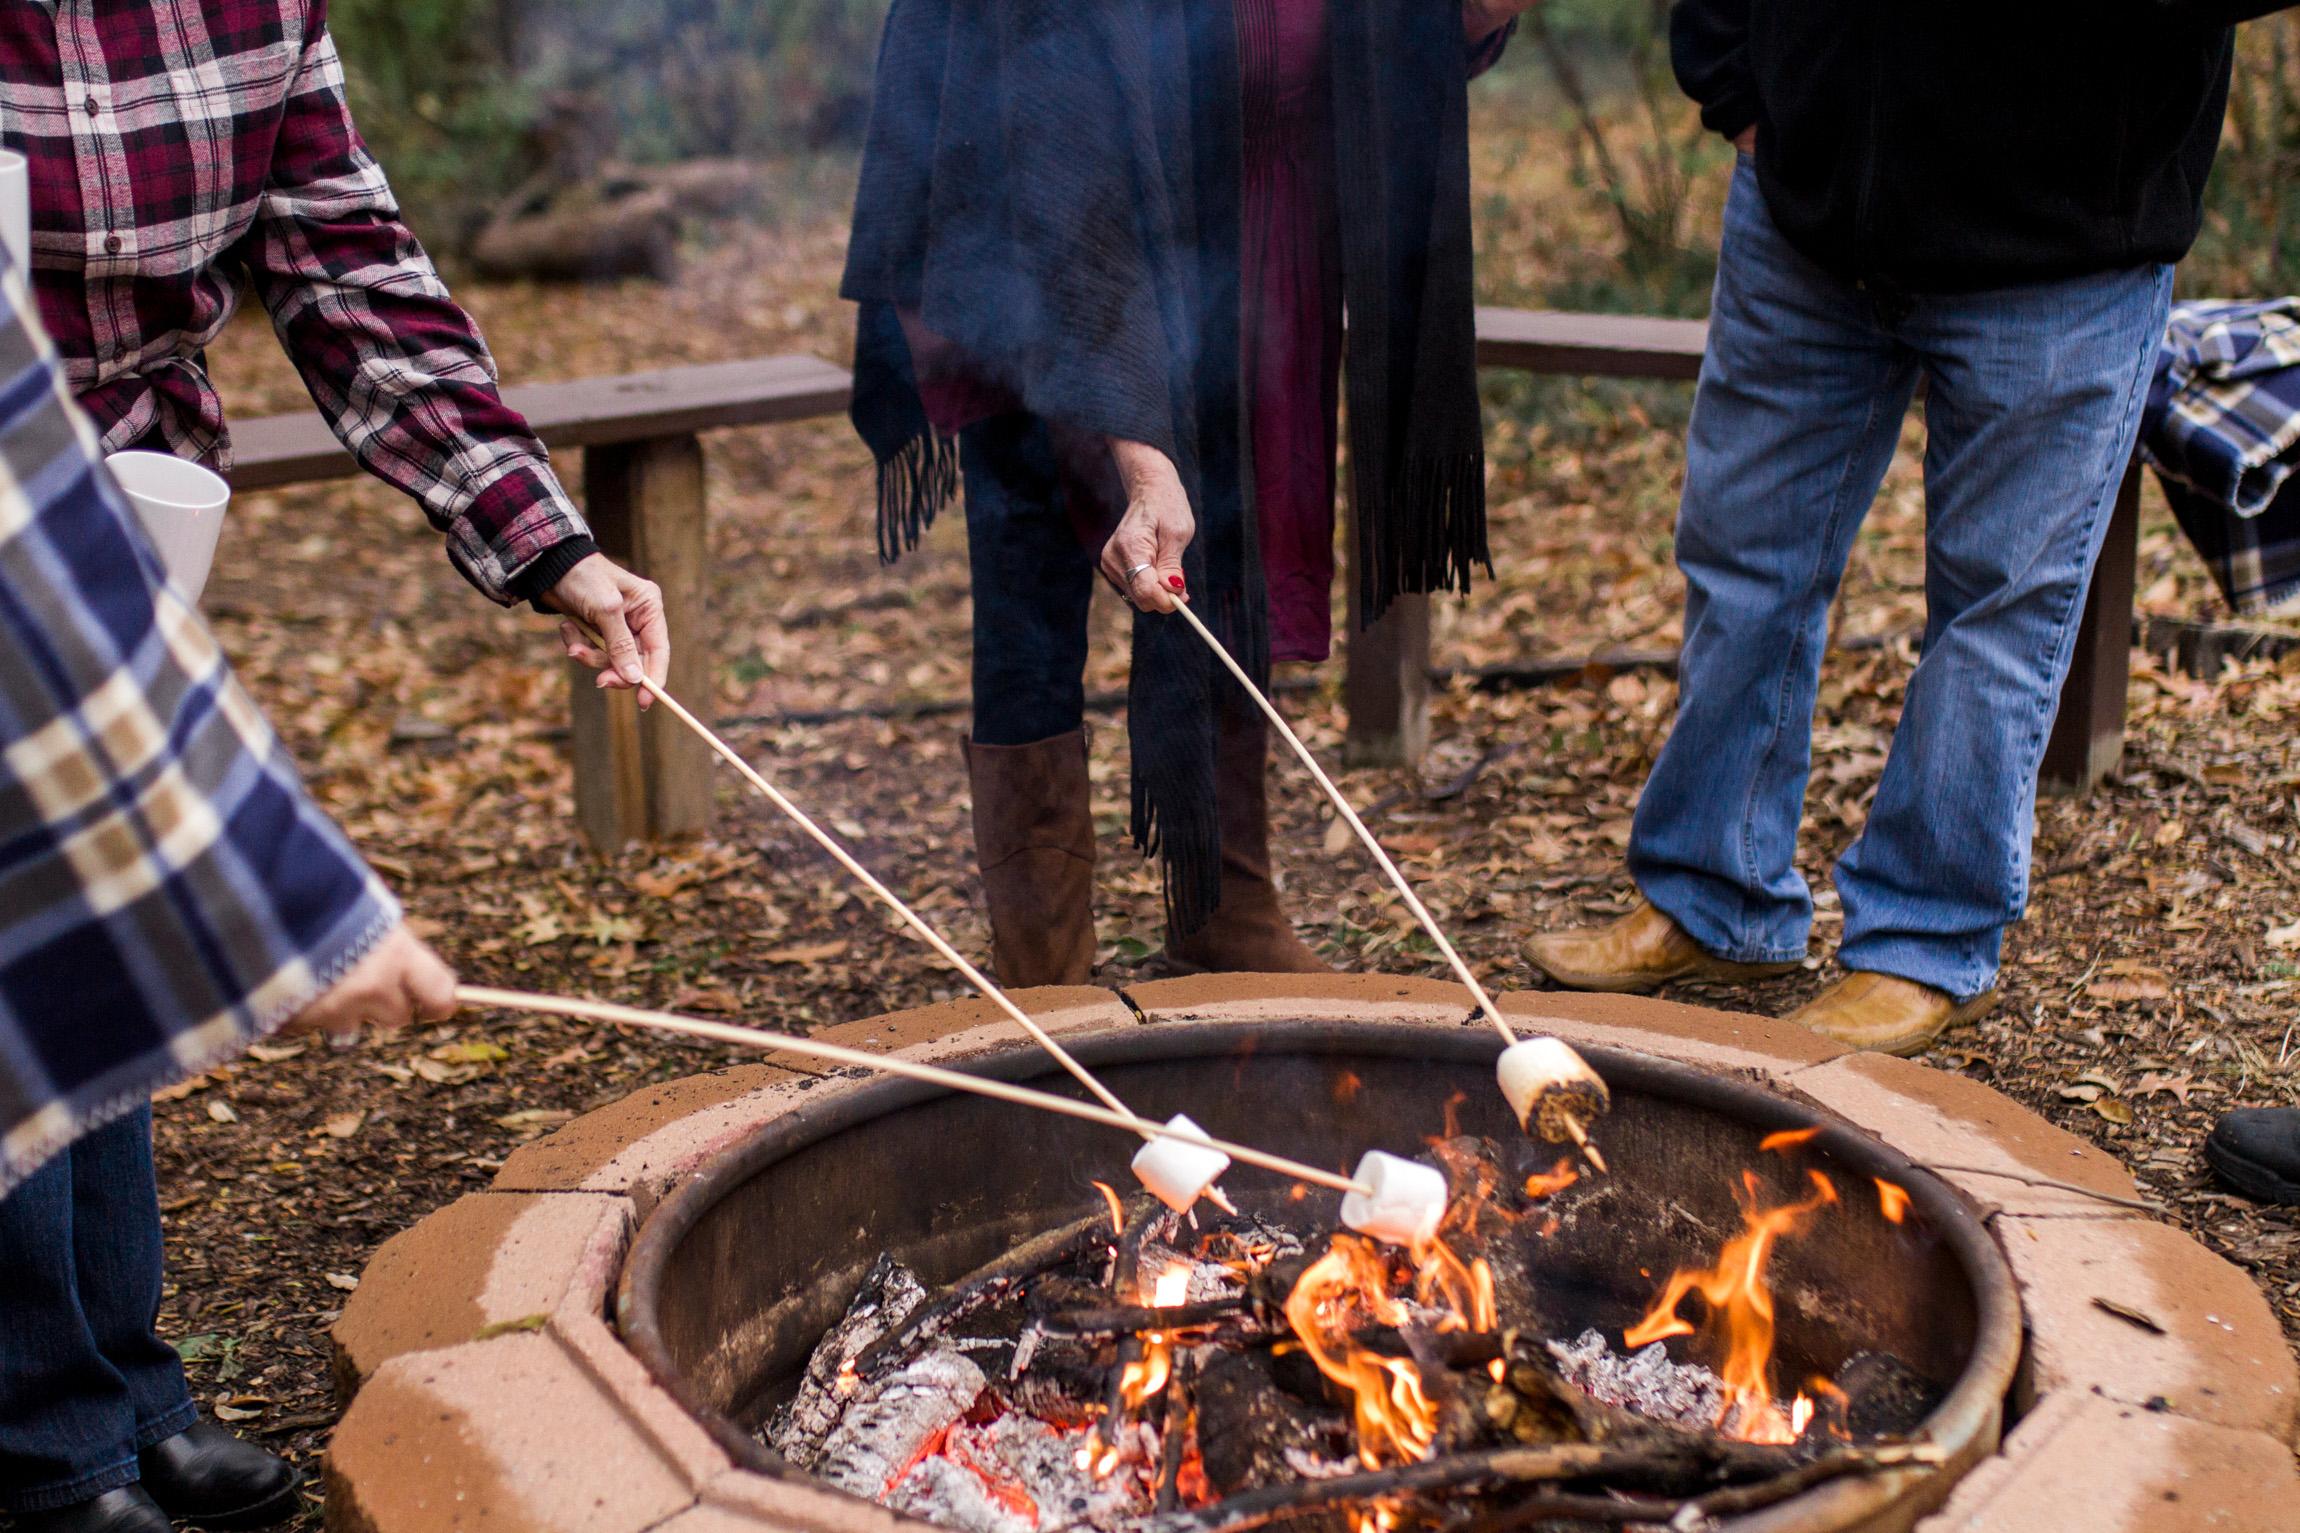 Kansas City lifestyle photographer, Kansas City family photographer, extended family session, fall family photos around a fire, roating marshmallows over the fire